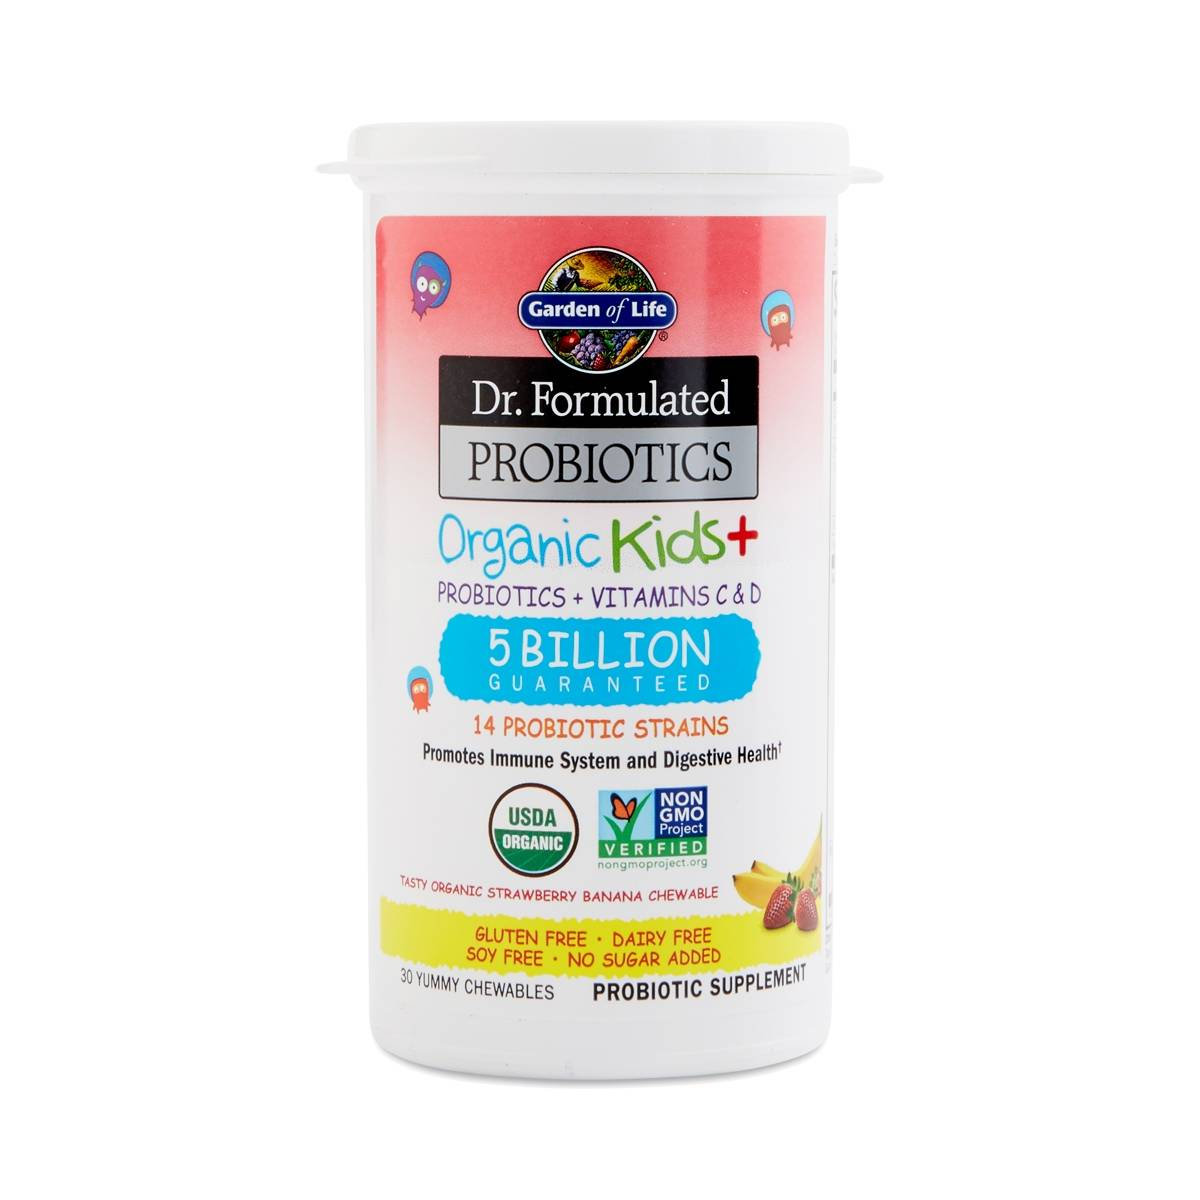 Strawberry Banana Dr Formulated Organic Kids Probiotics Thrive Market